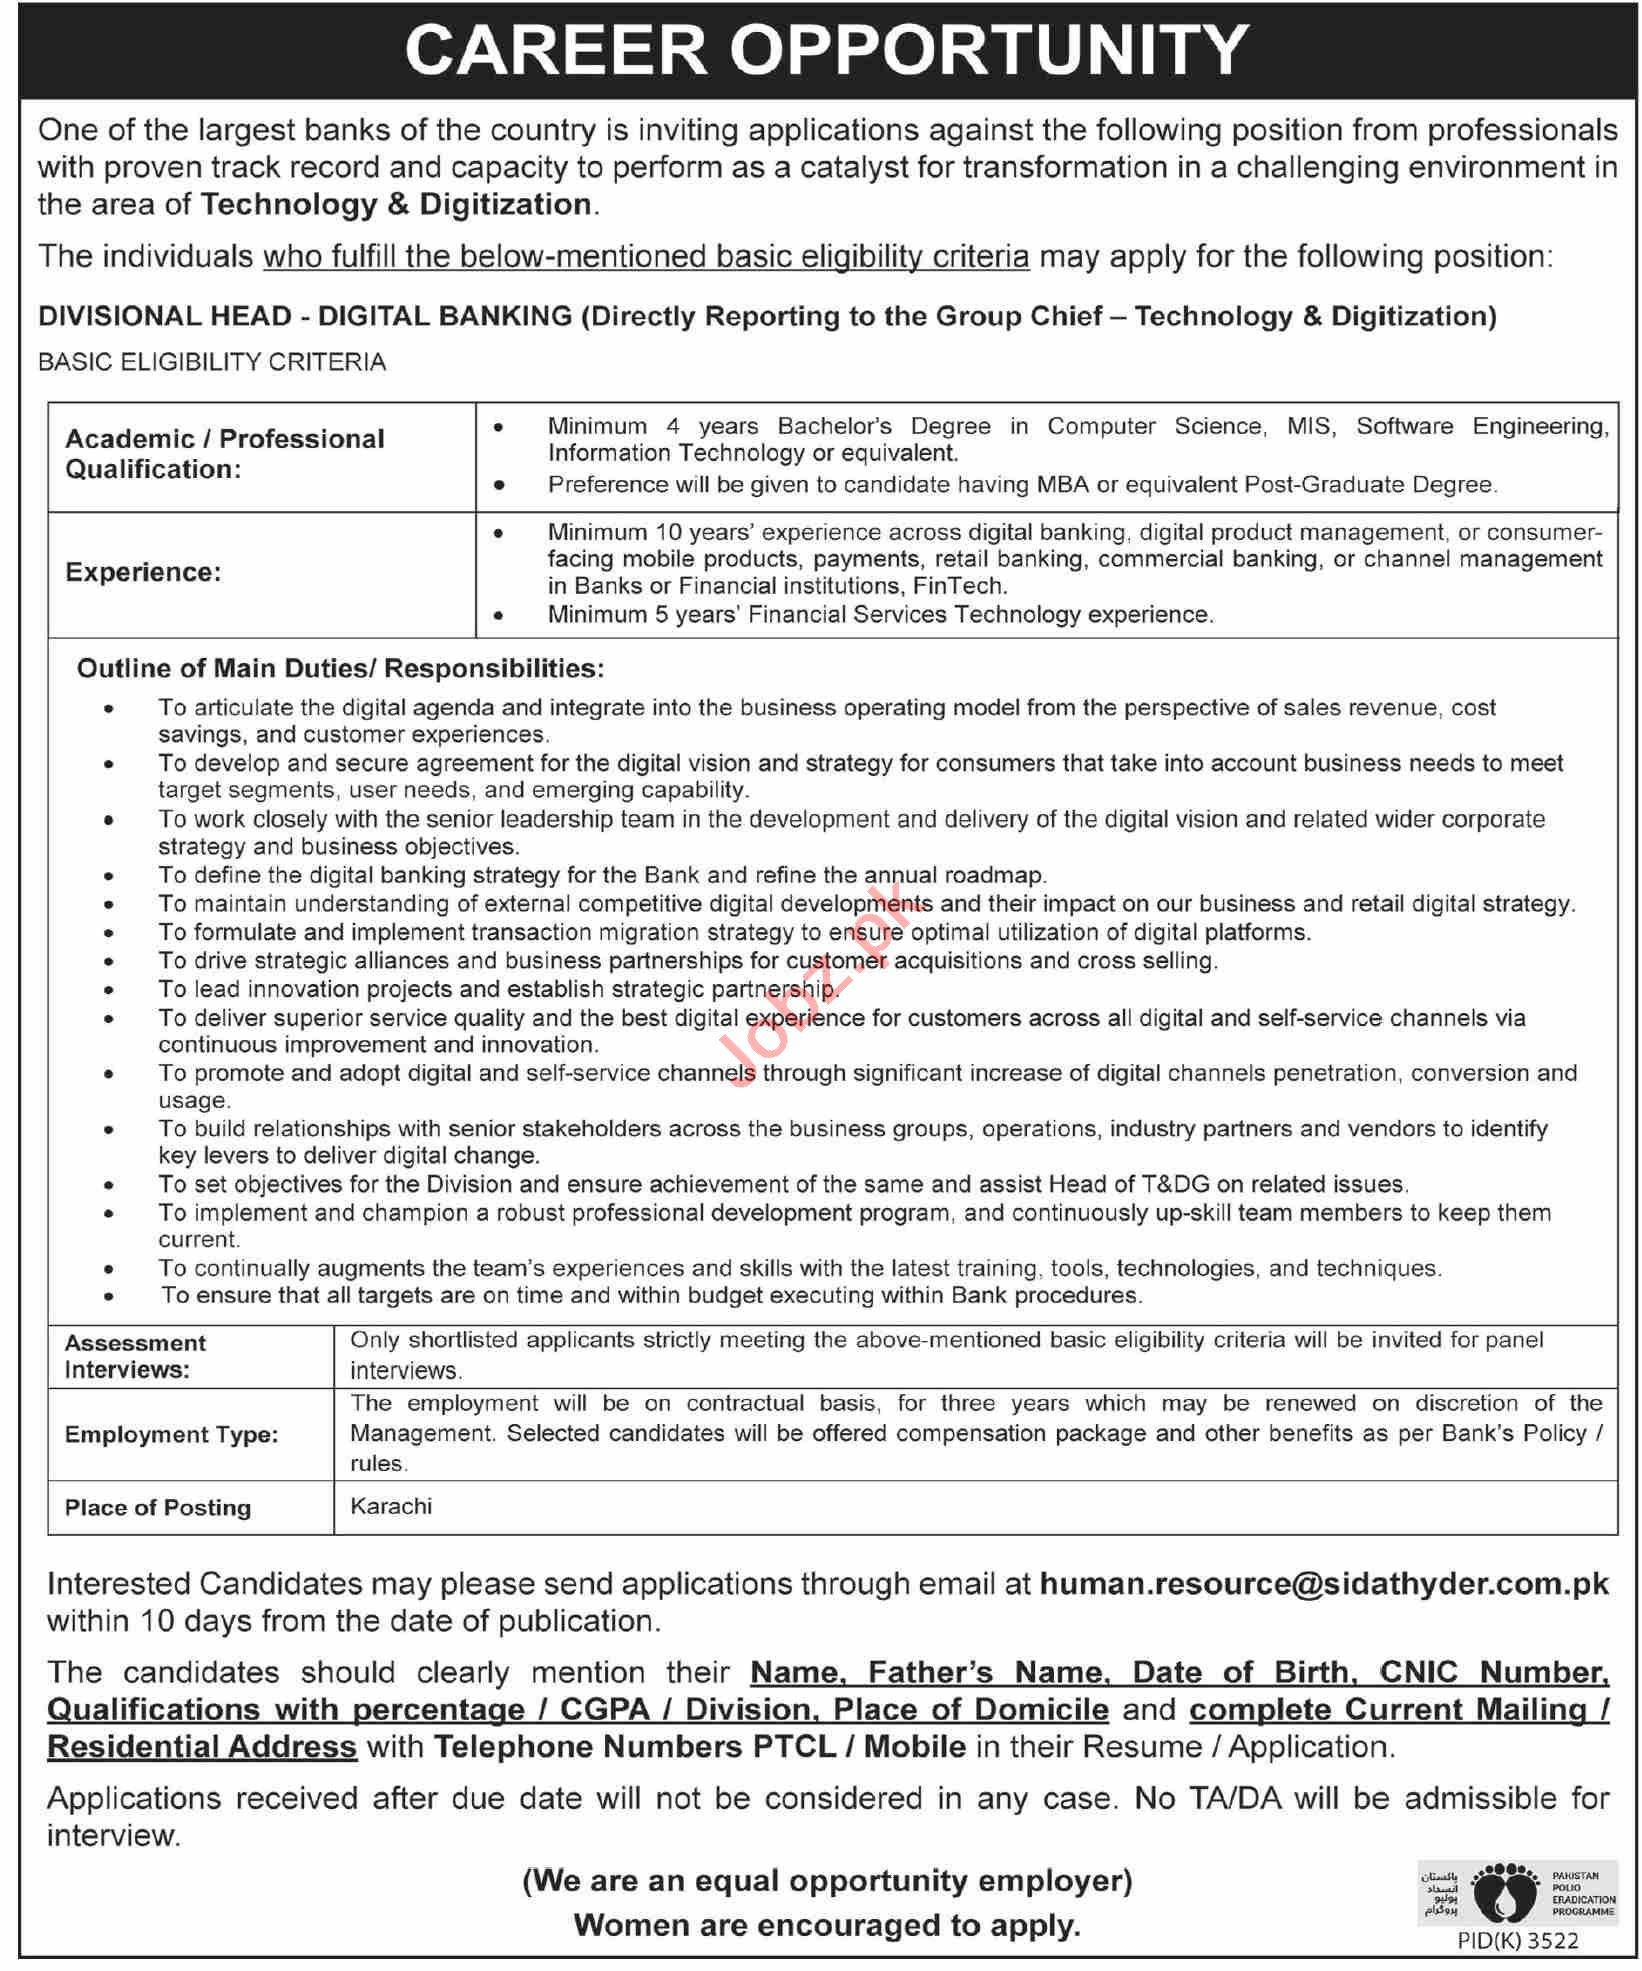 Divisional Head Digital Banking Jobs 2020 in Karachi